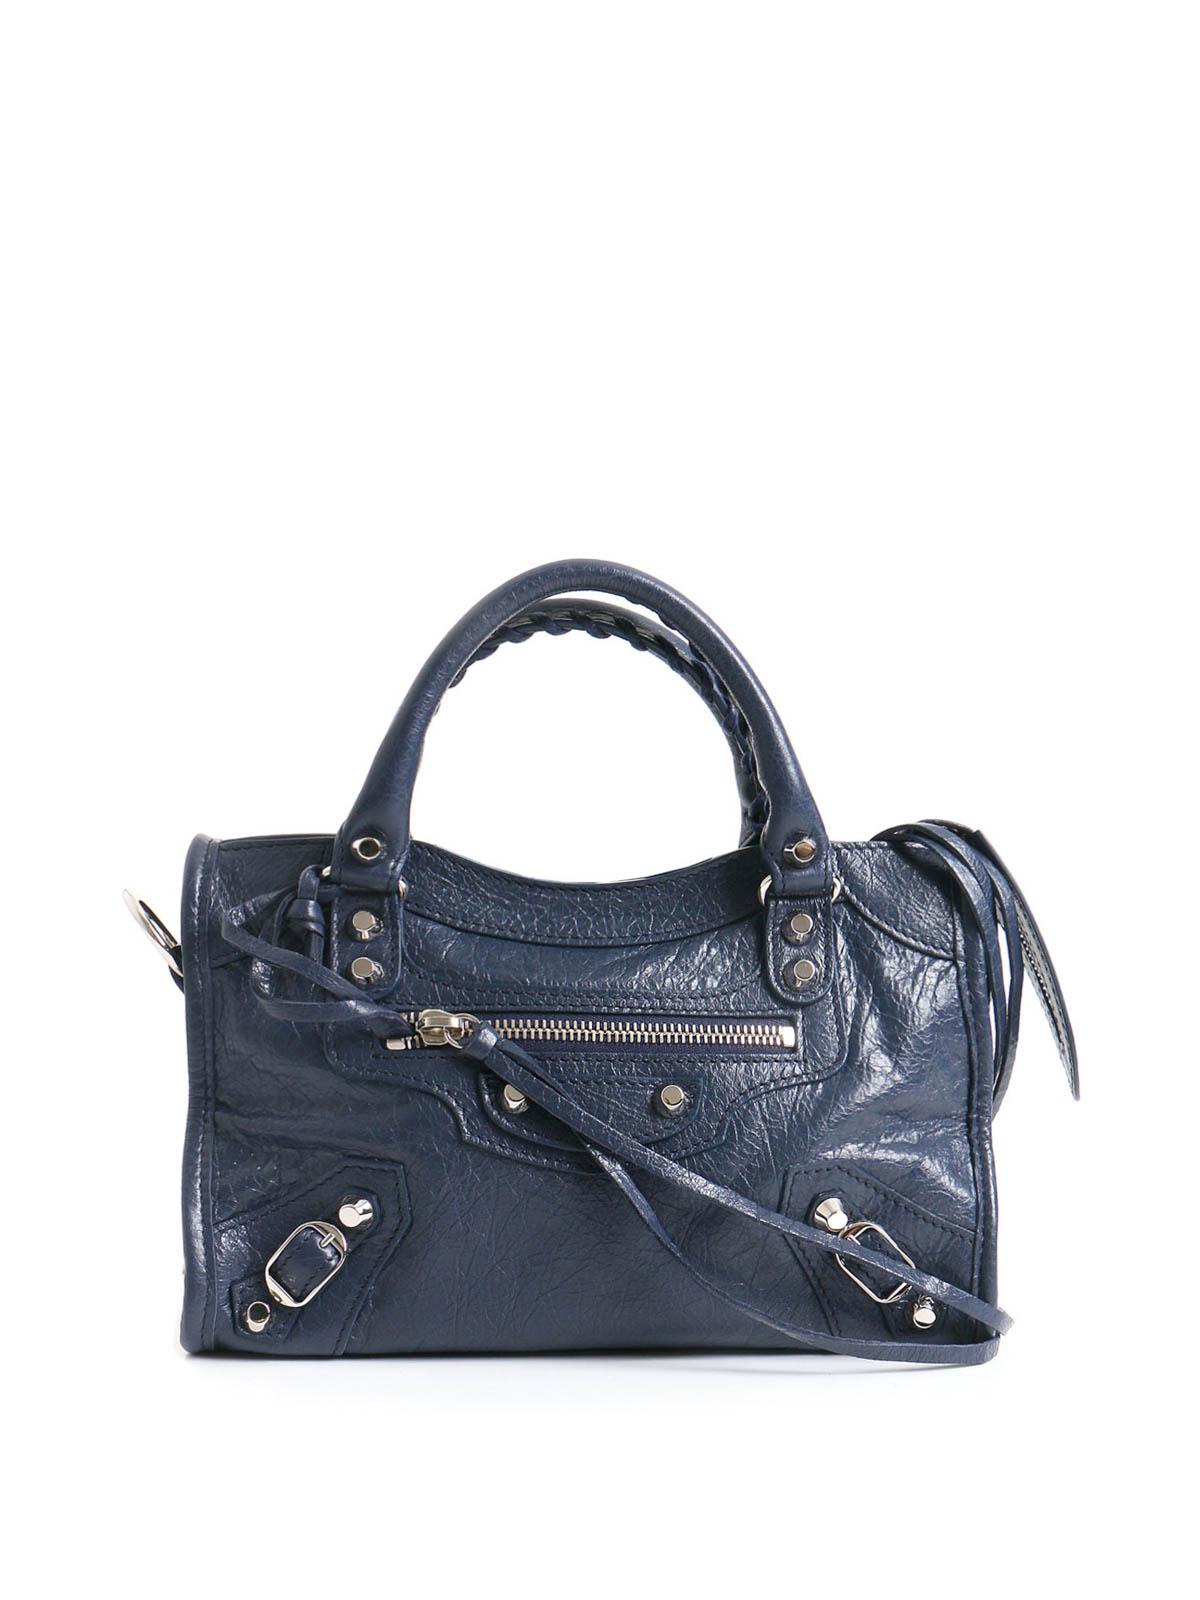 Silver City leather tote by Balenciaga